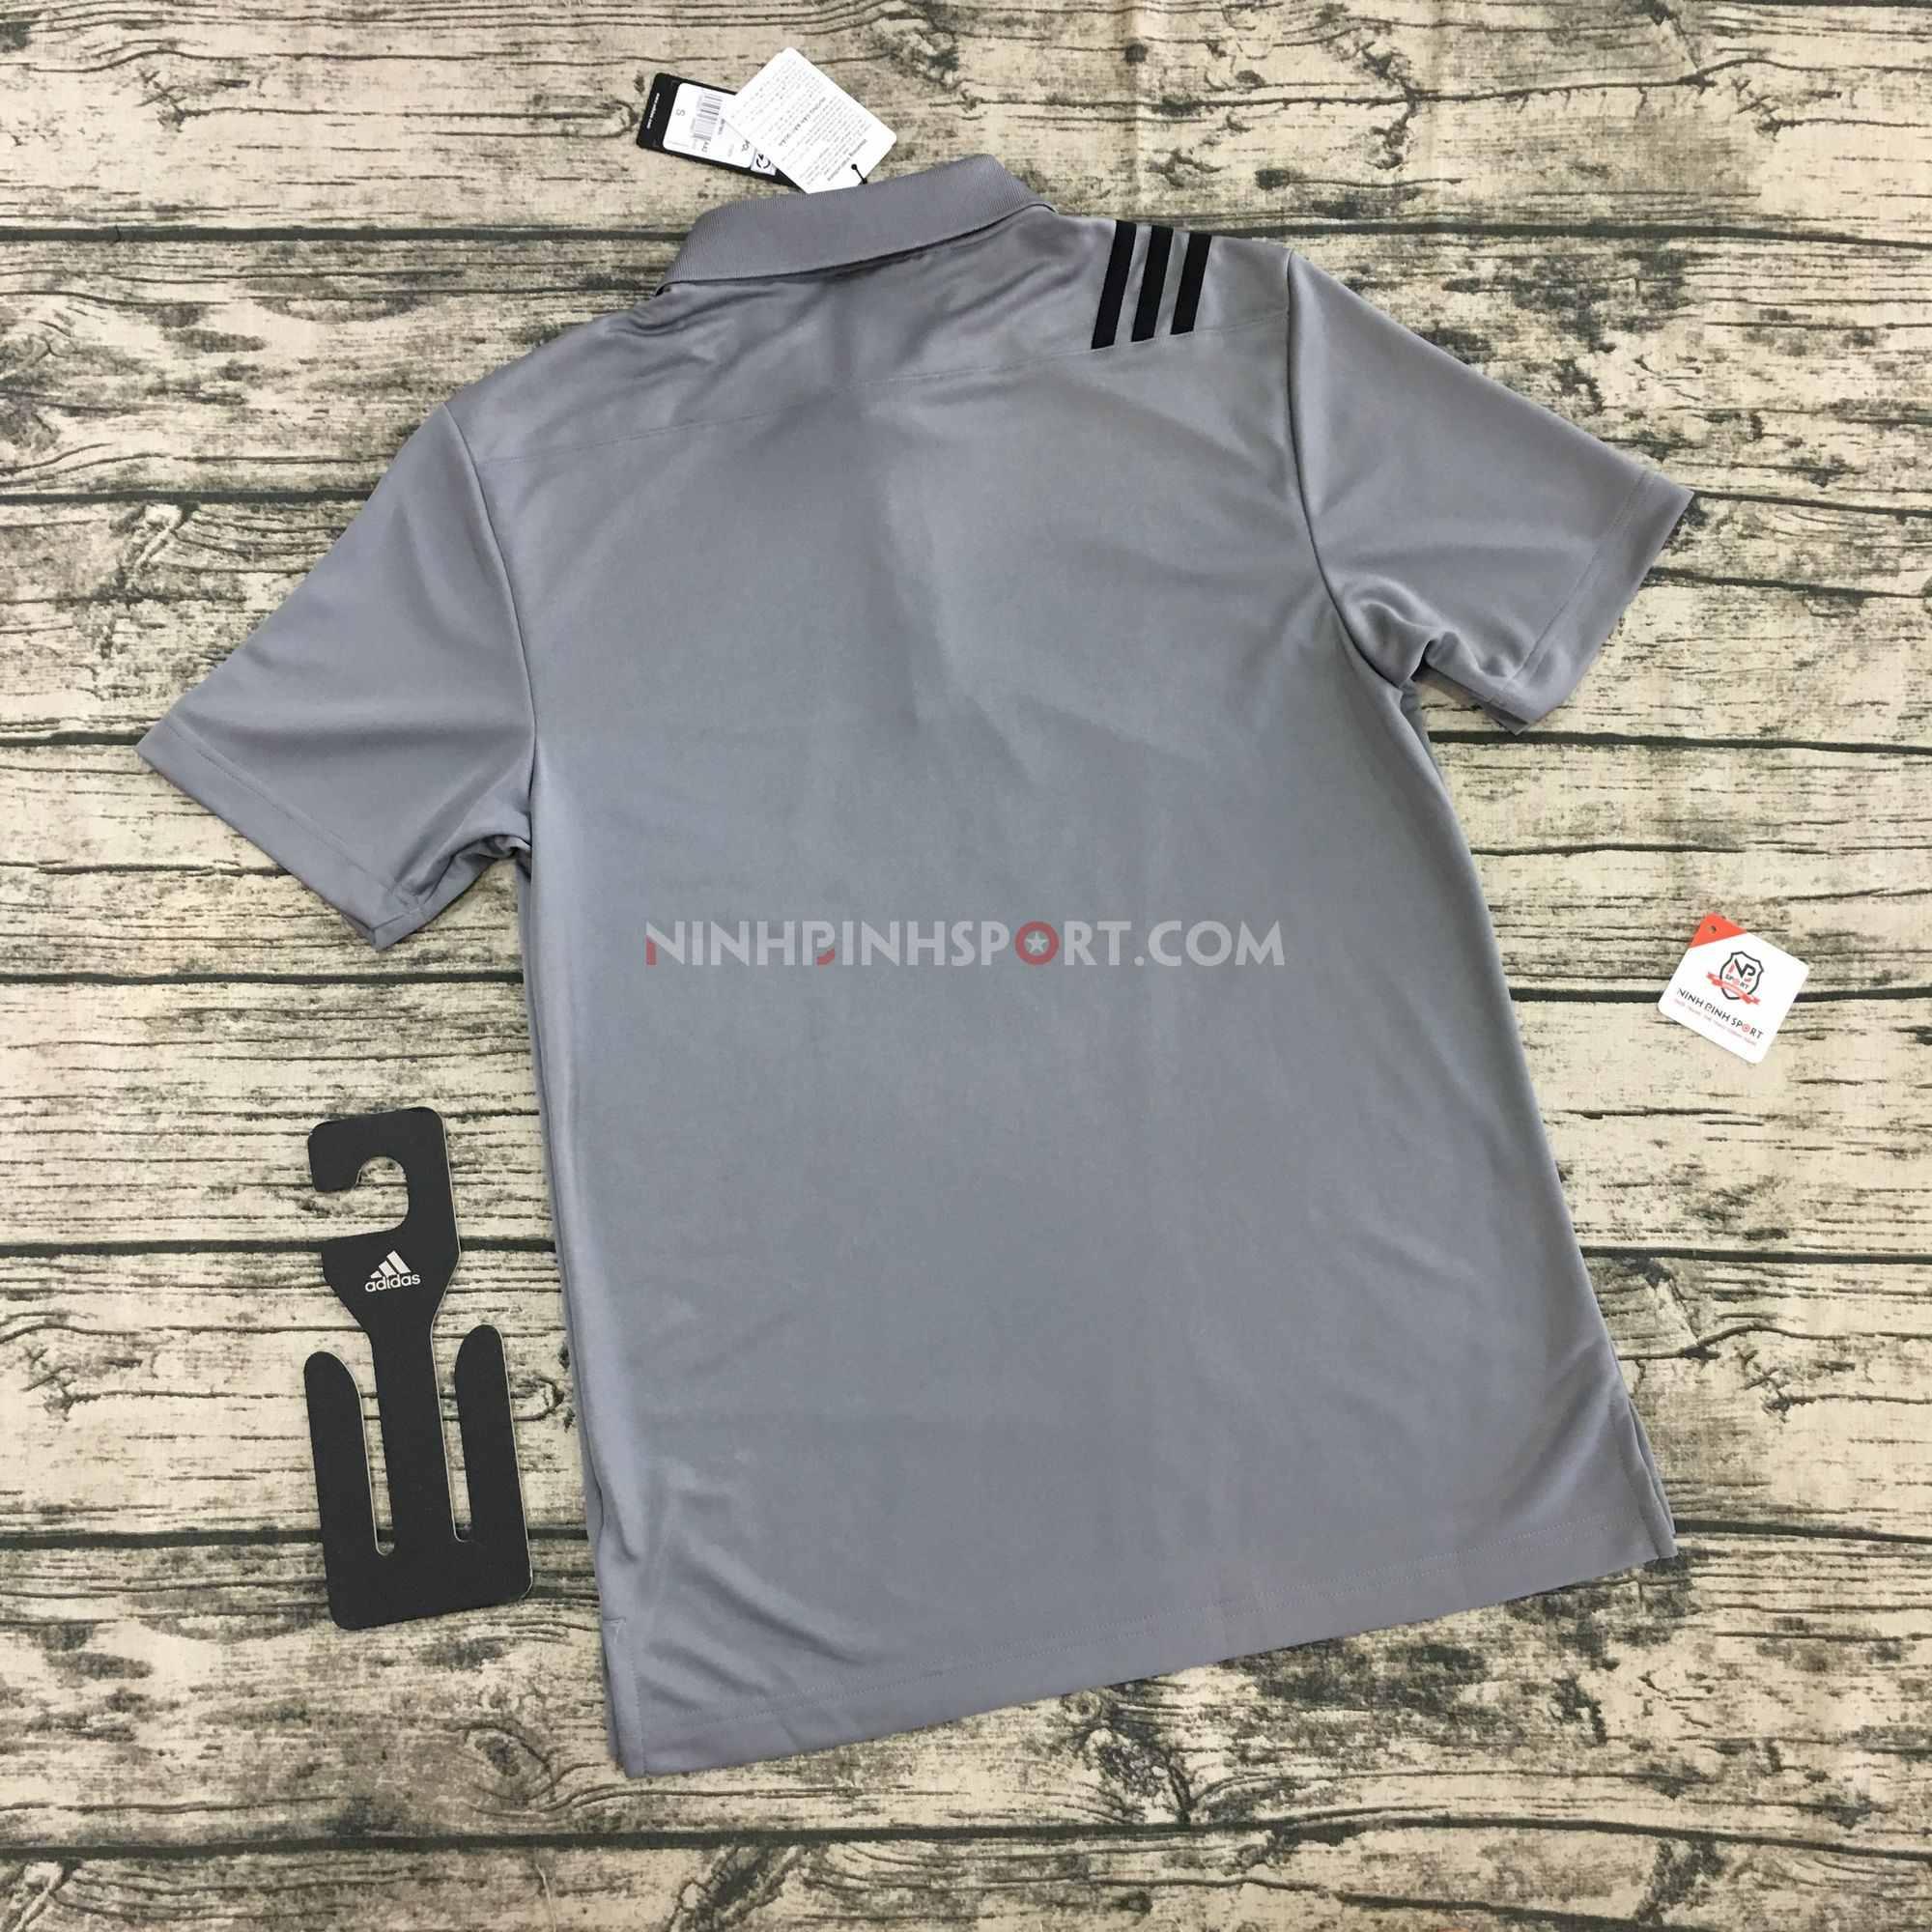 Áo thể thao nam Adidas Golf 3-Stripes Polo - Grey DT3608